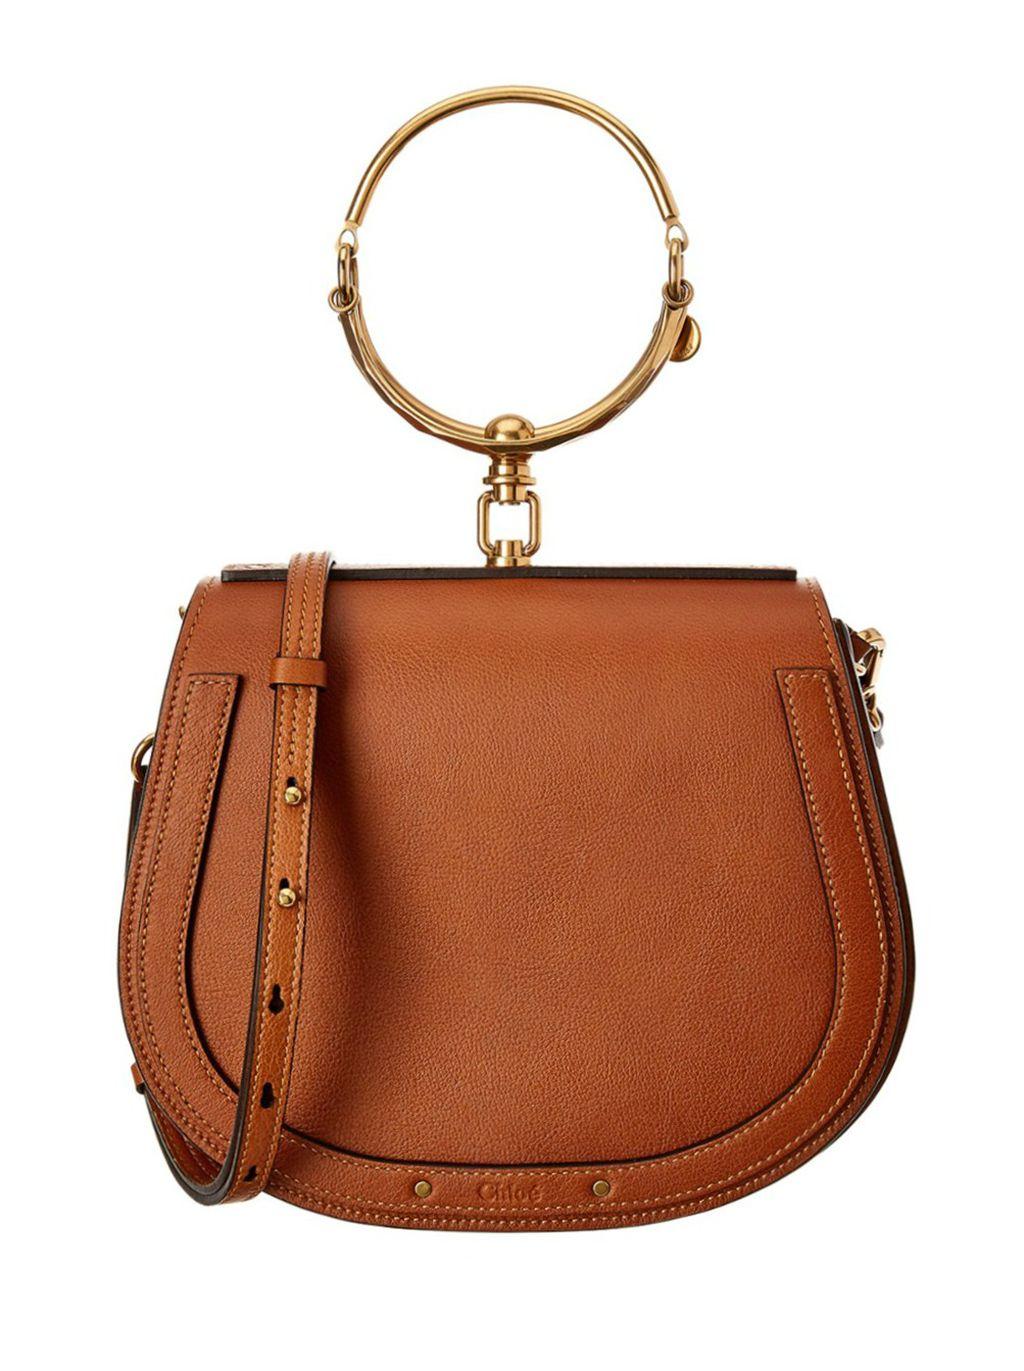 Medium torba Nile modne kuće Chloe